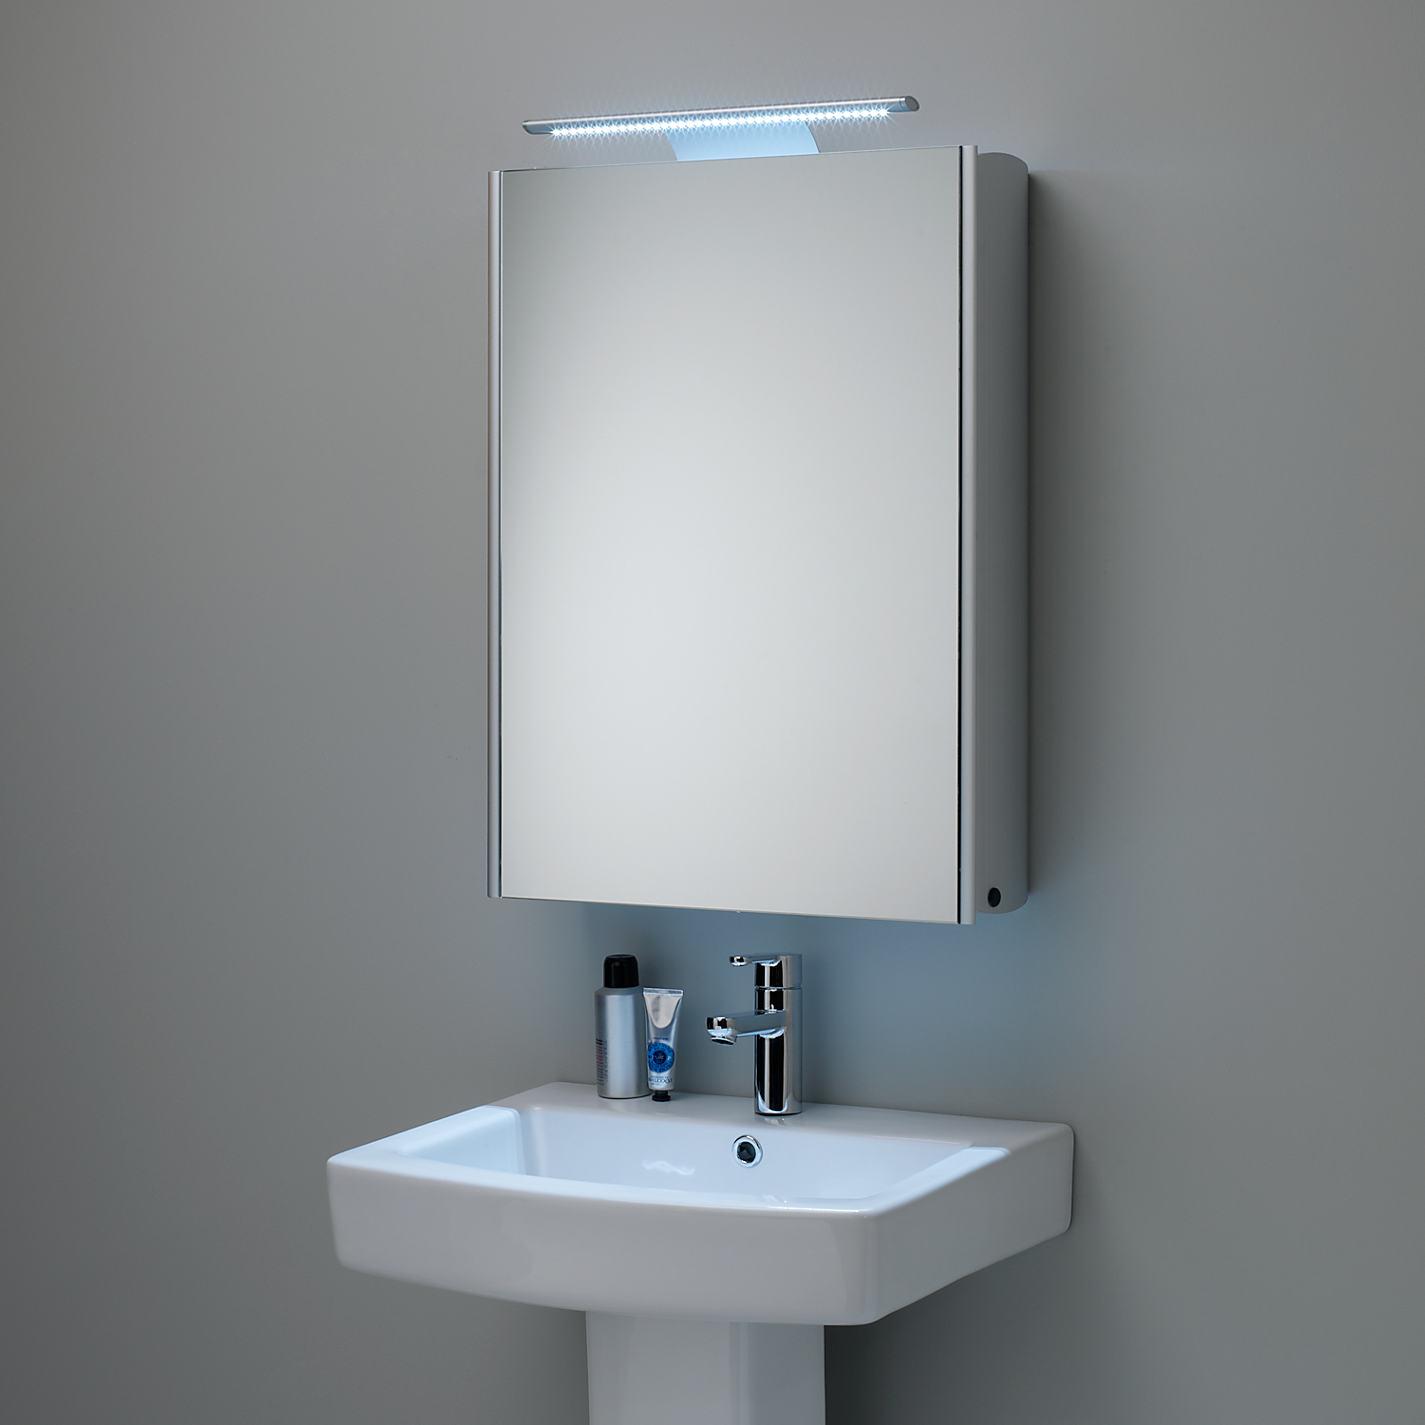 Mirrored Bathroom furniture image of: mirrored bathroom cabinet HODNLVS